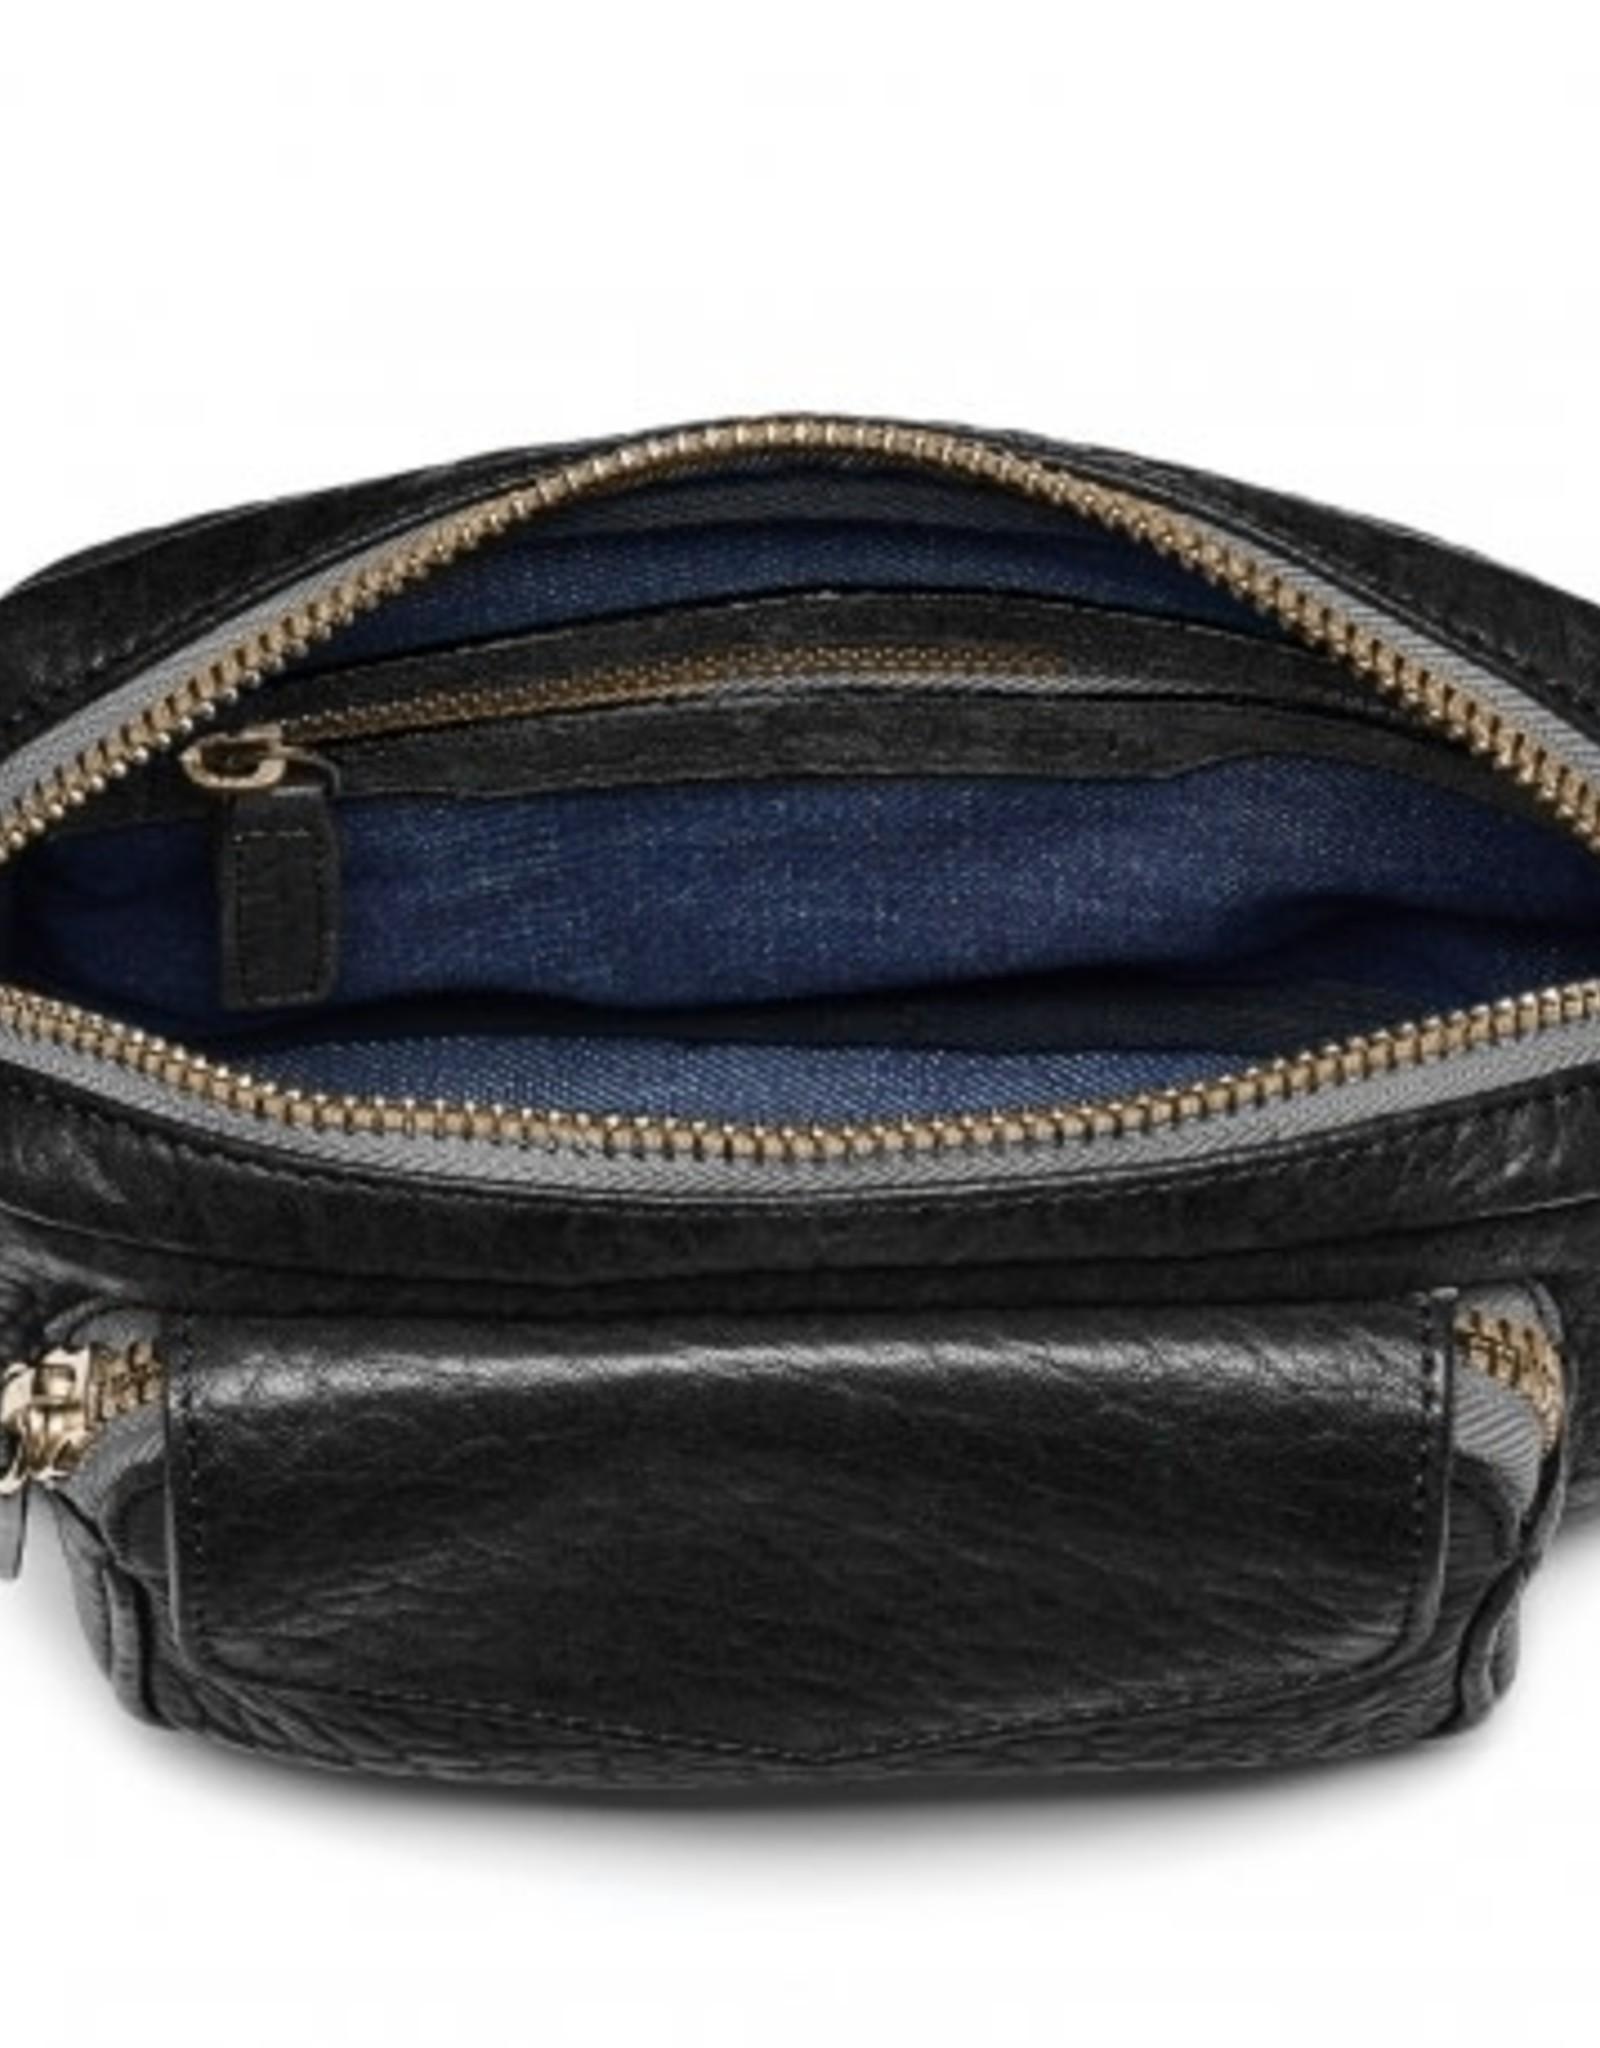 Claris Virot Charly Bag